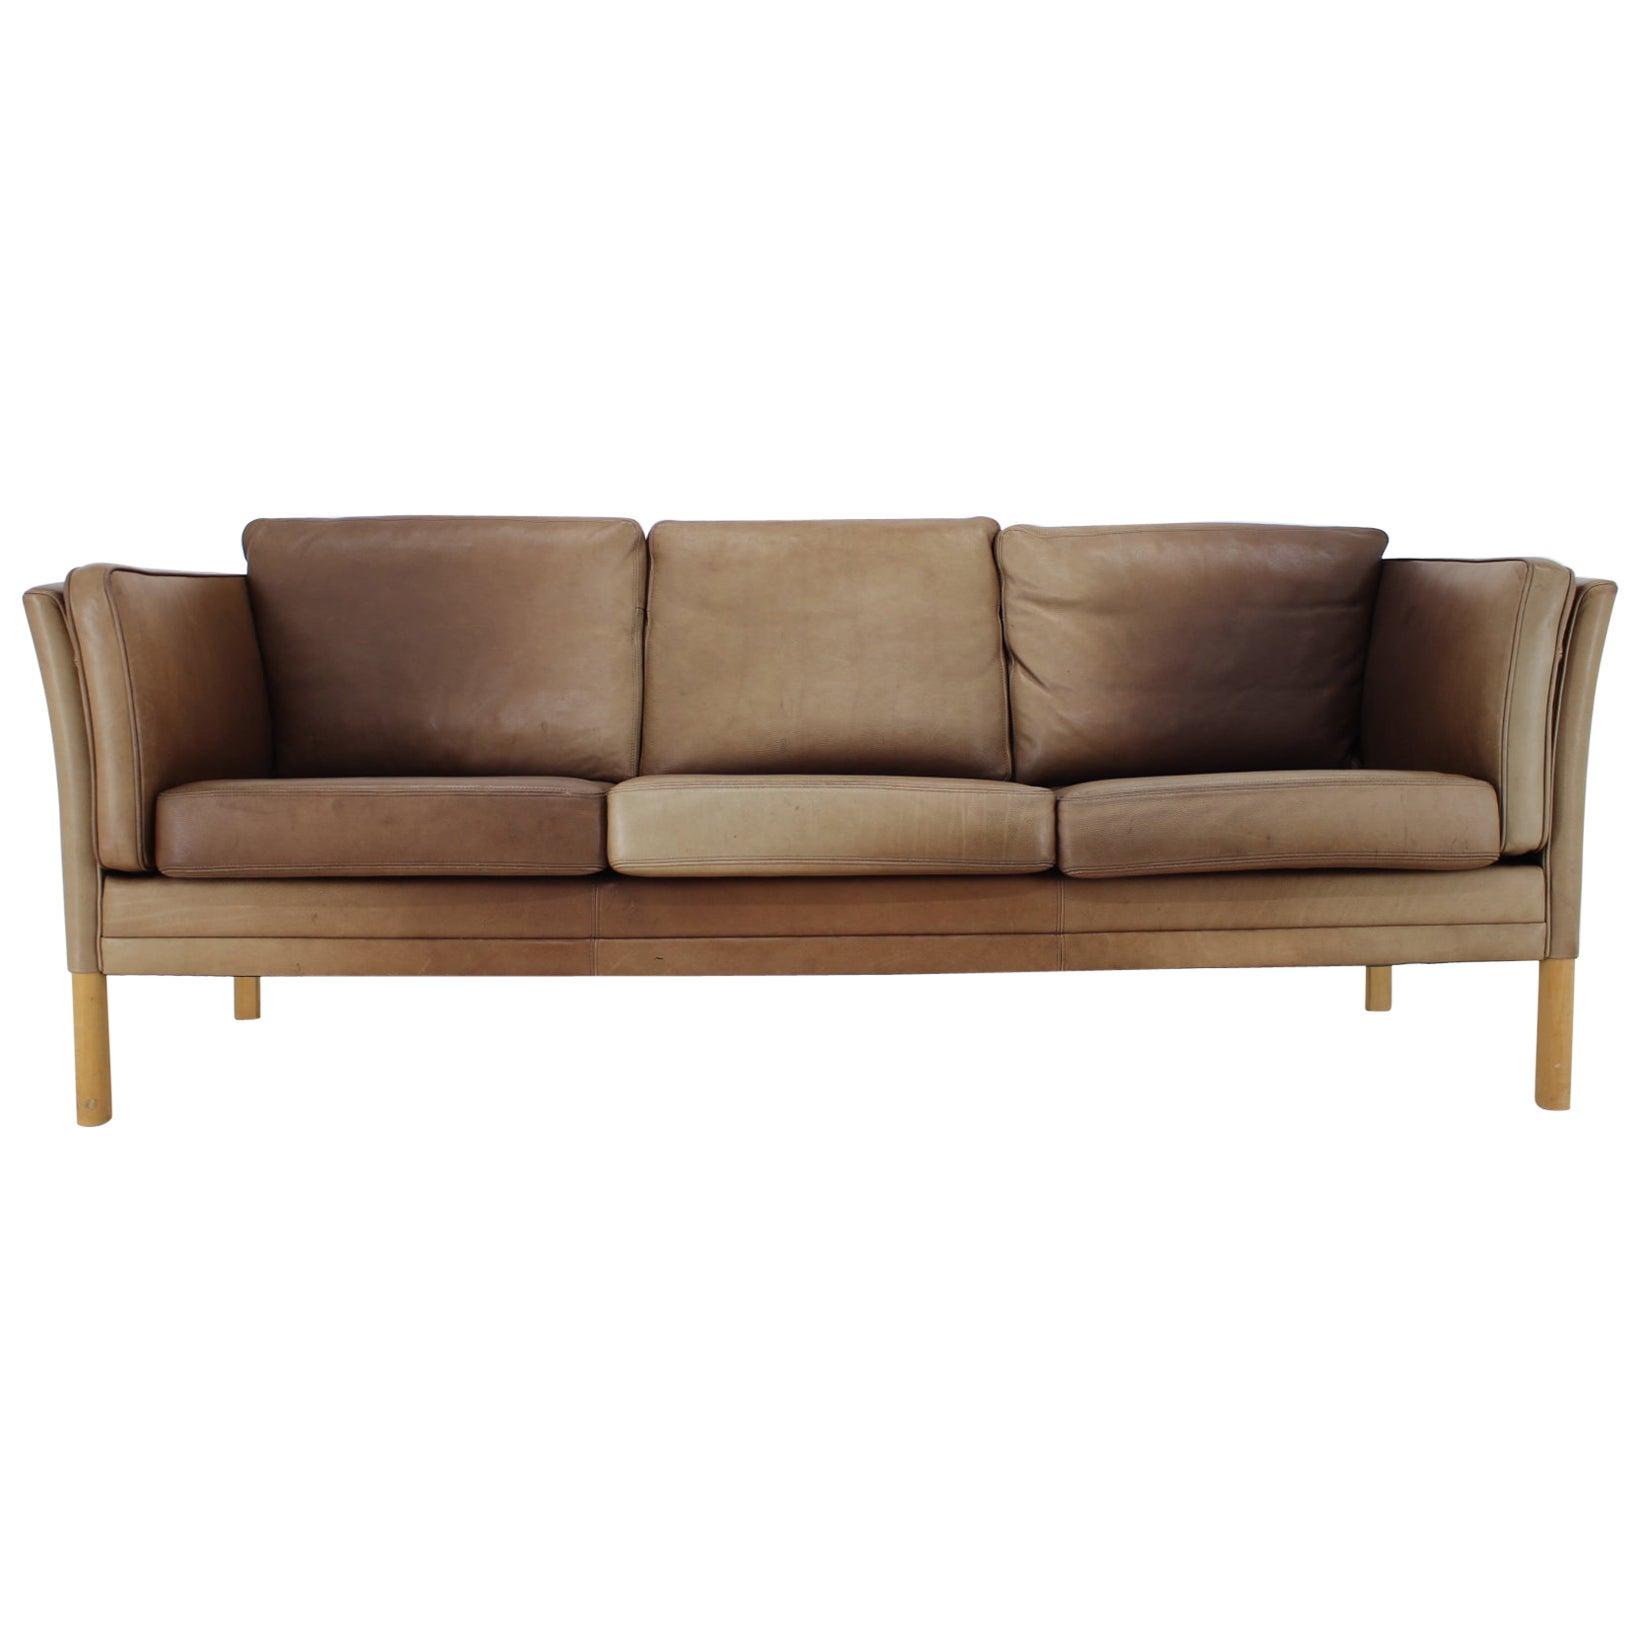 1960s Georg Thams Leather 3-Seat Sofa